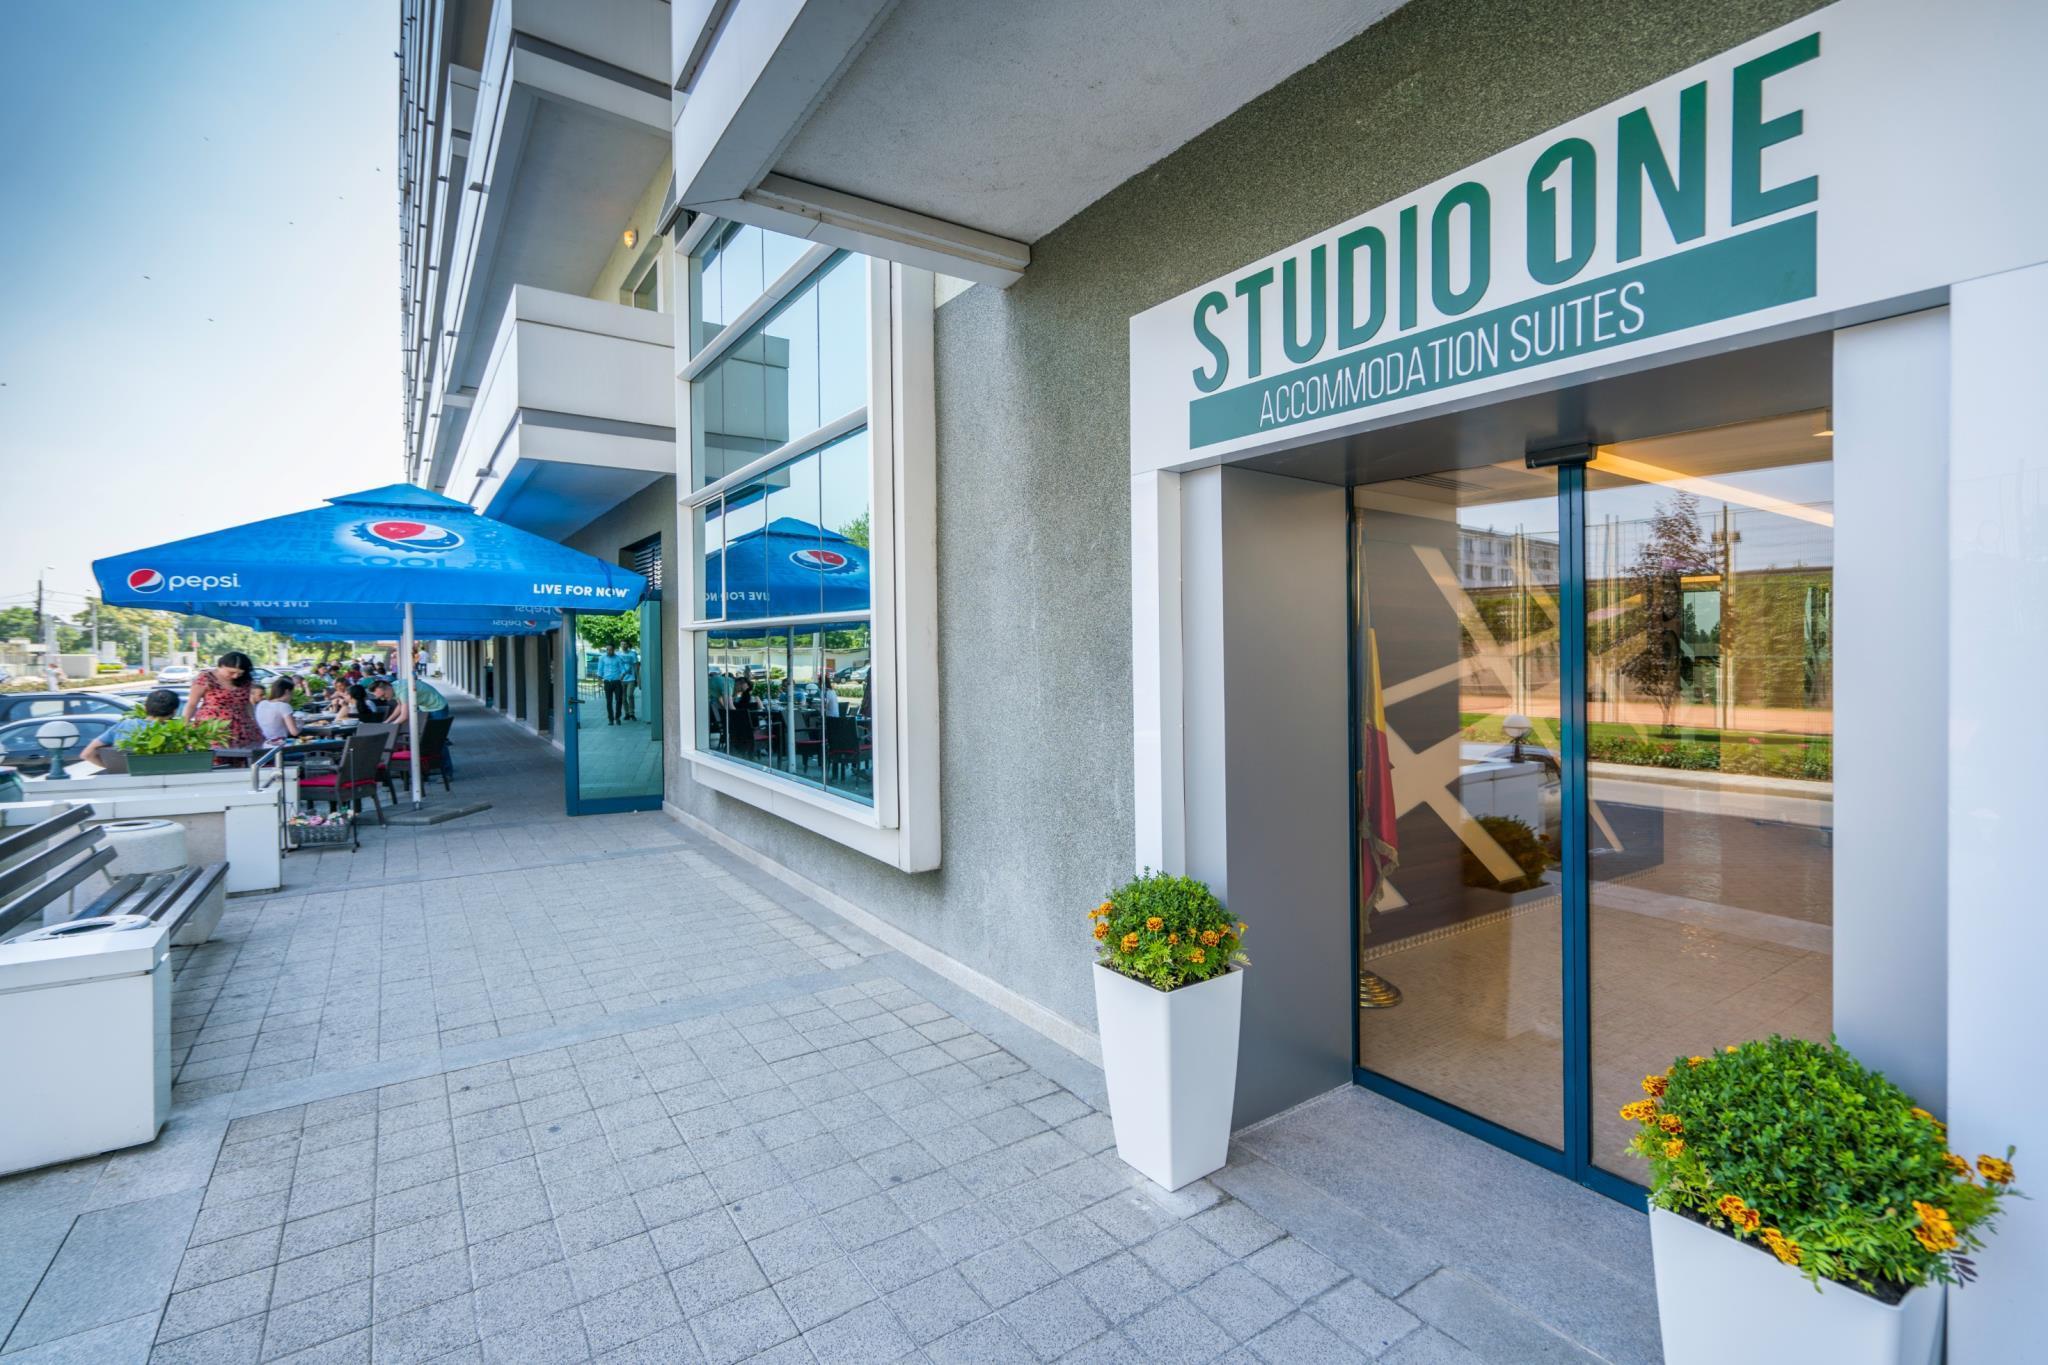 Studio One Accommodation Suites